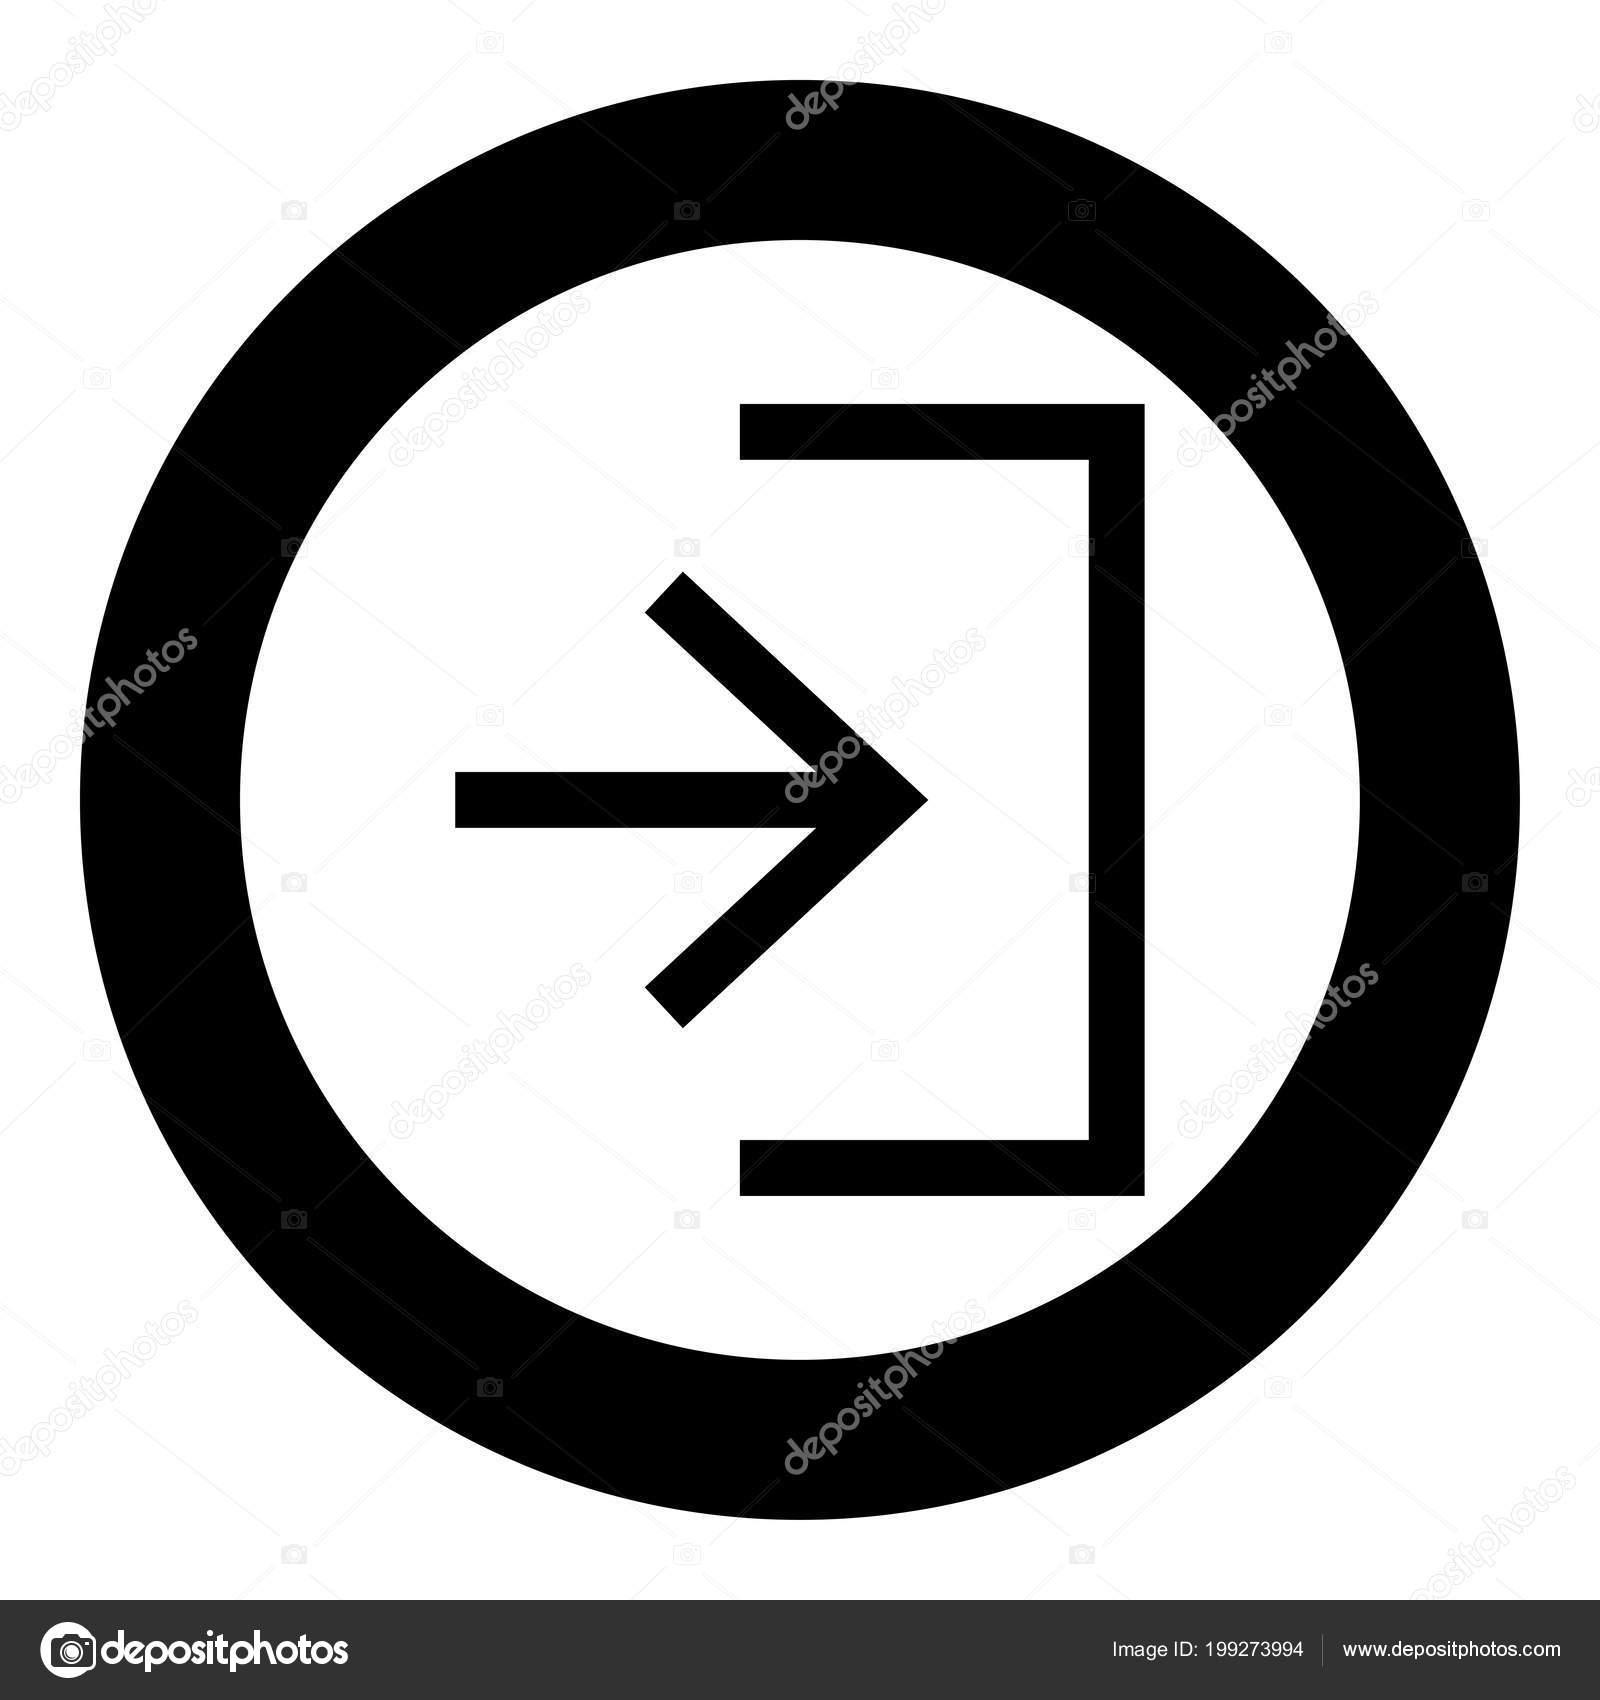 eintrag eingabe türfarbe schwarz symbol kreis vektor illustration